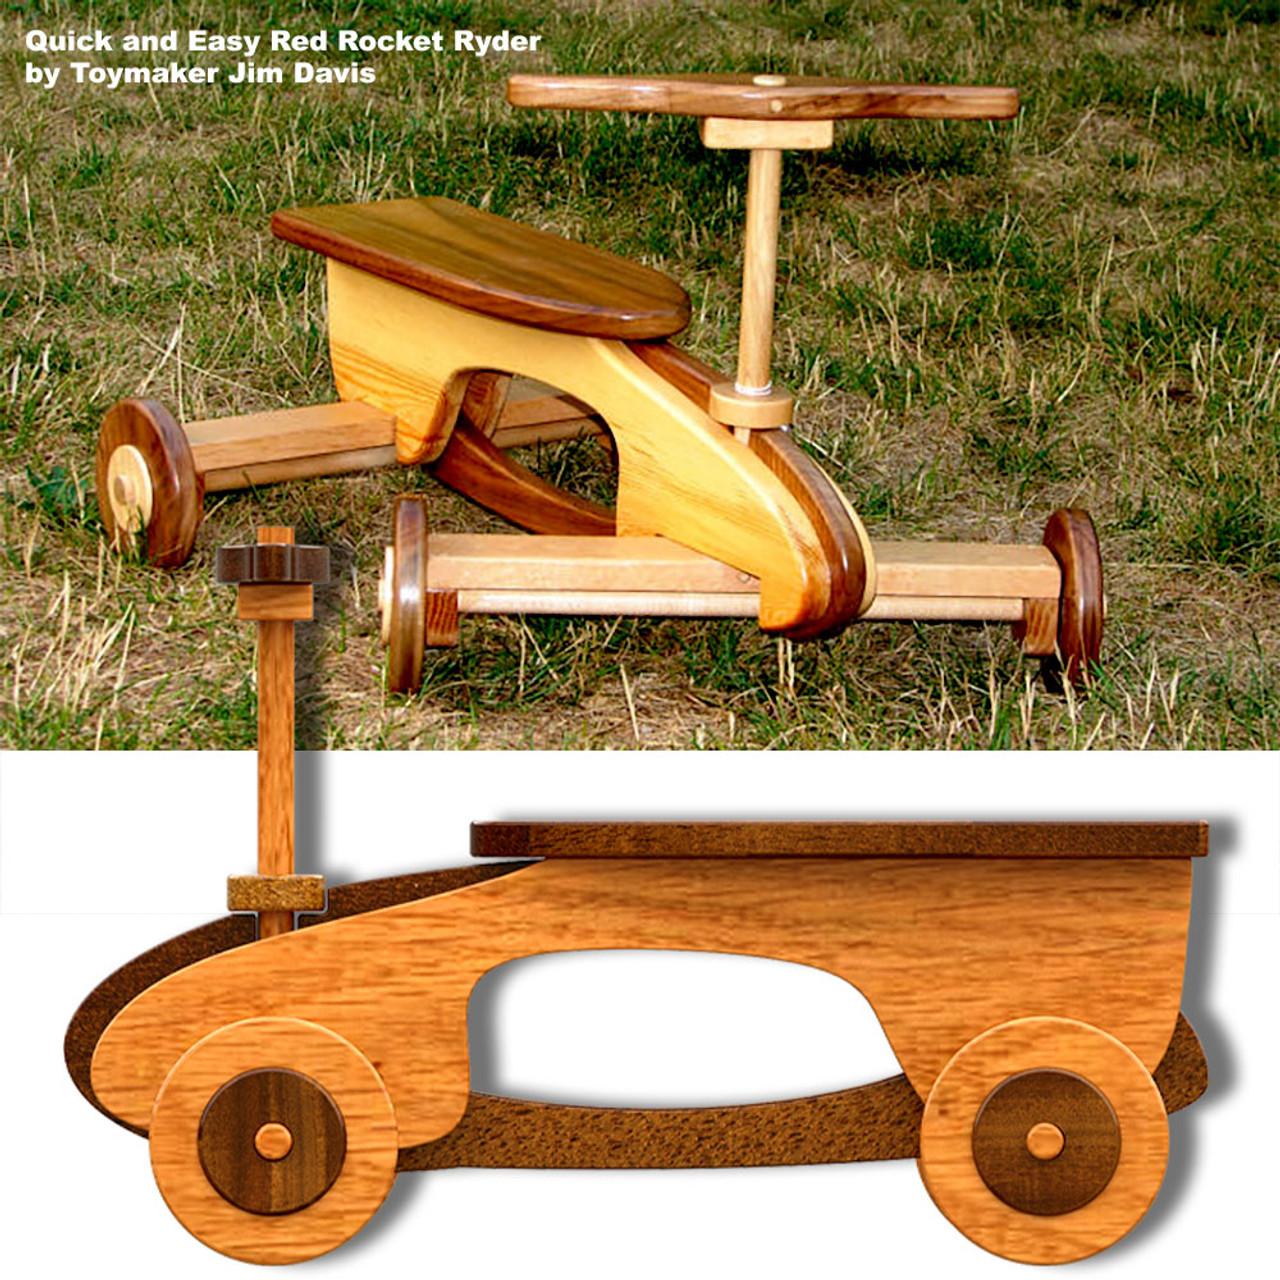 quick & easy red rocket ryder wood toy plans (pdf download)